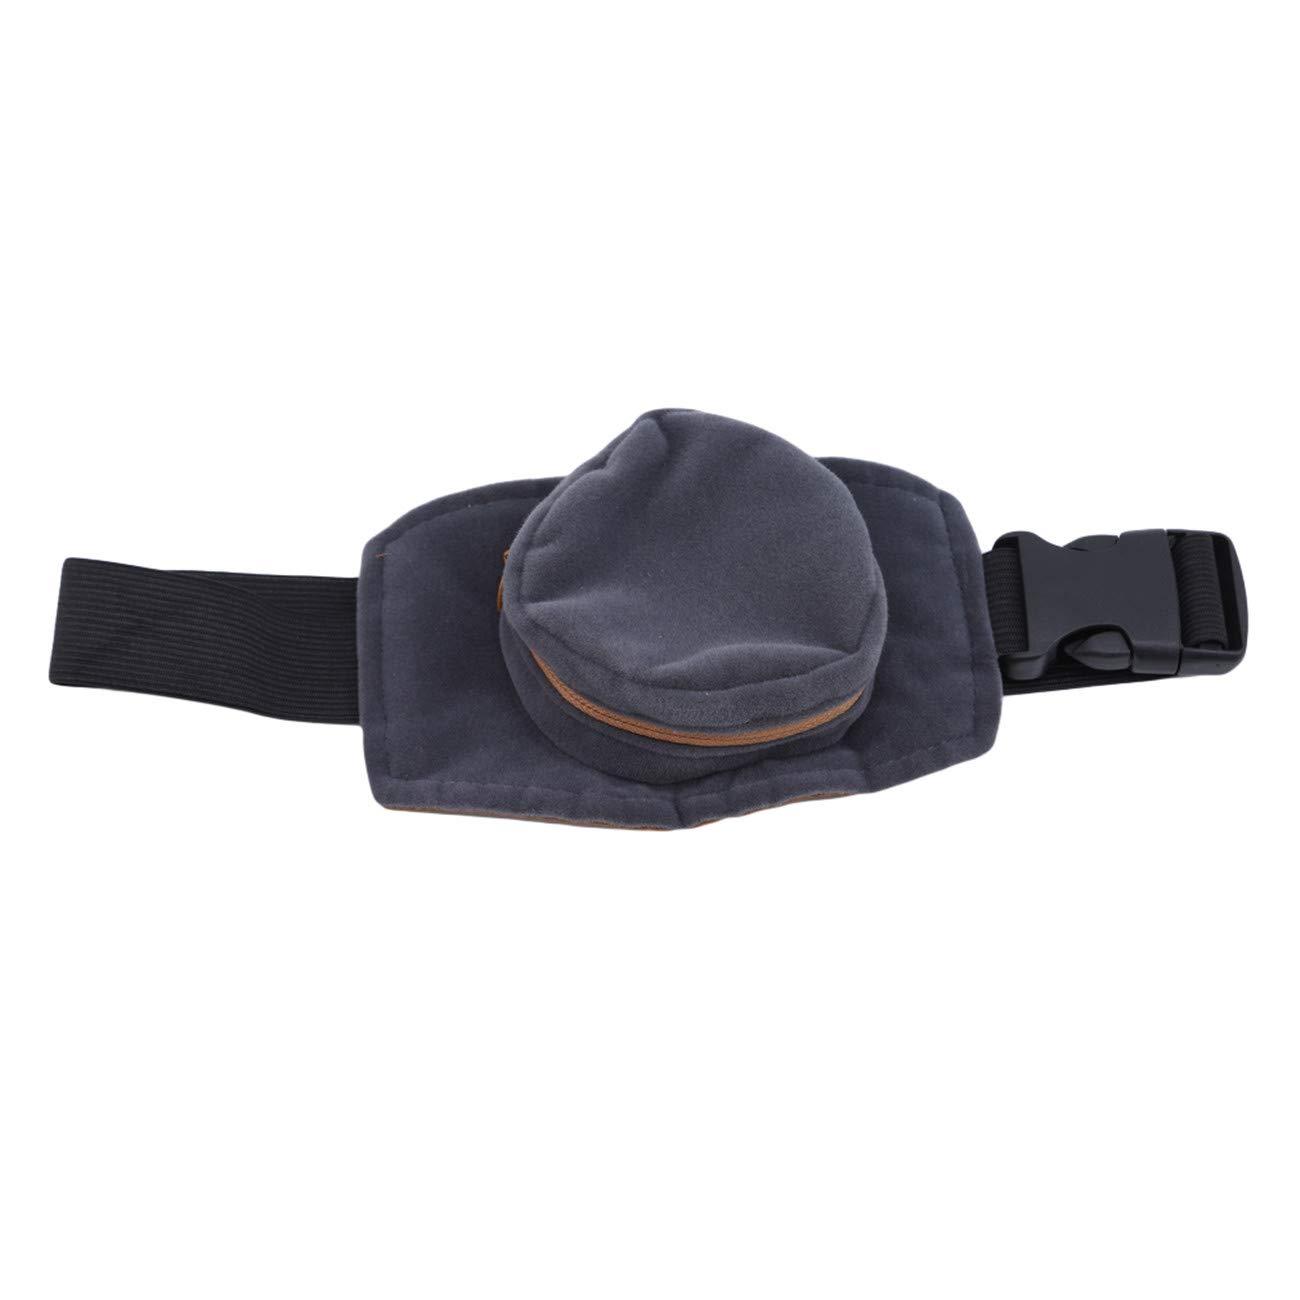 ZALING Moxibustion Smokeless Bag with Moxibustion Single Moxibustion Box Cloth Cover #1